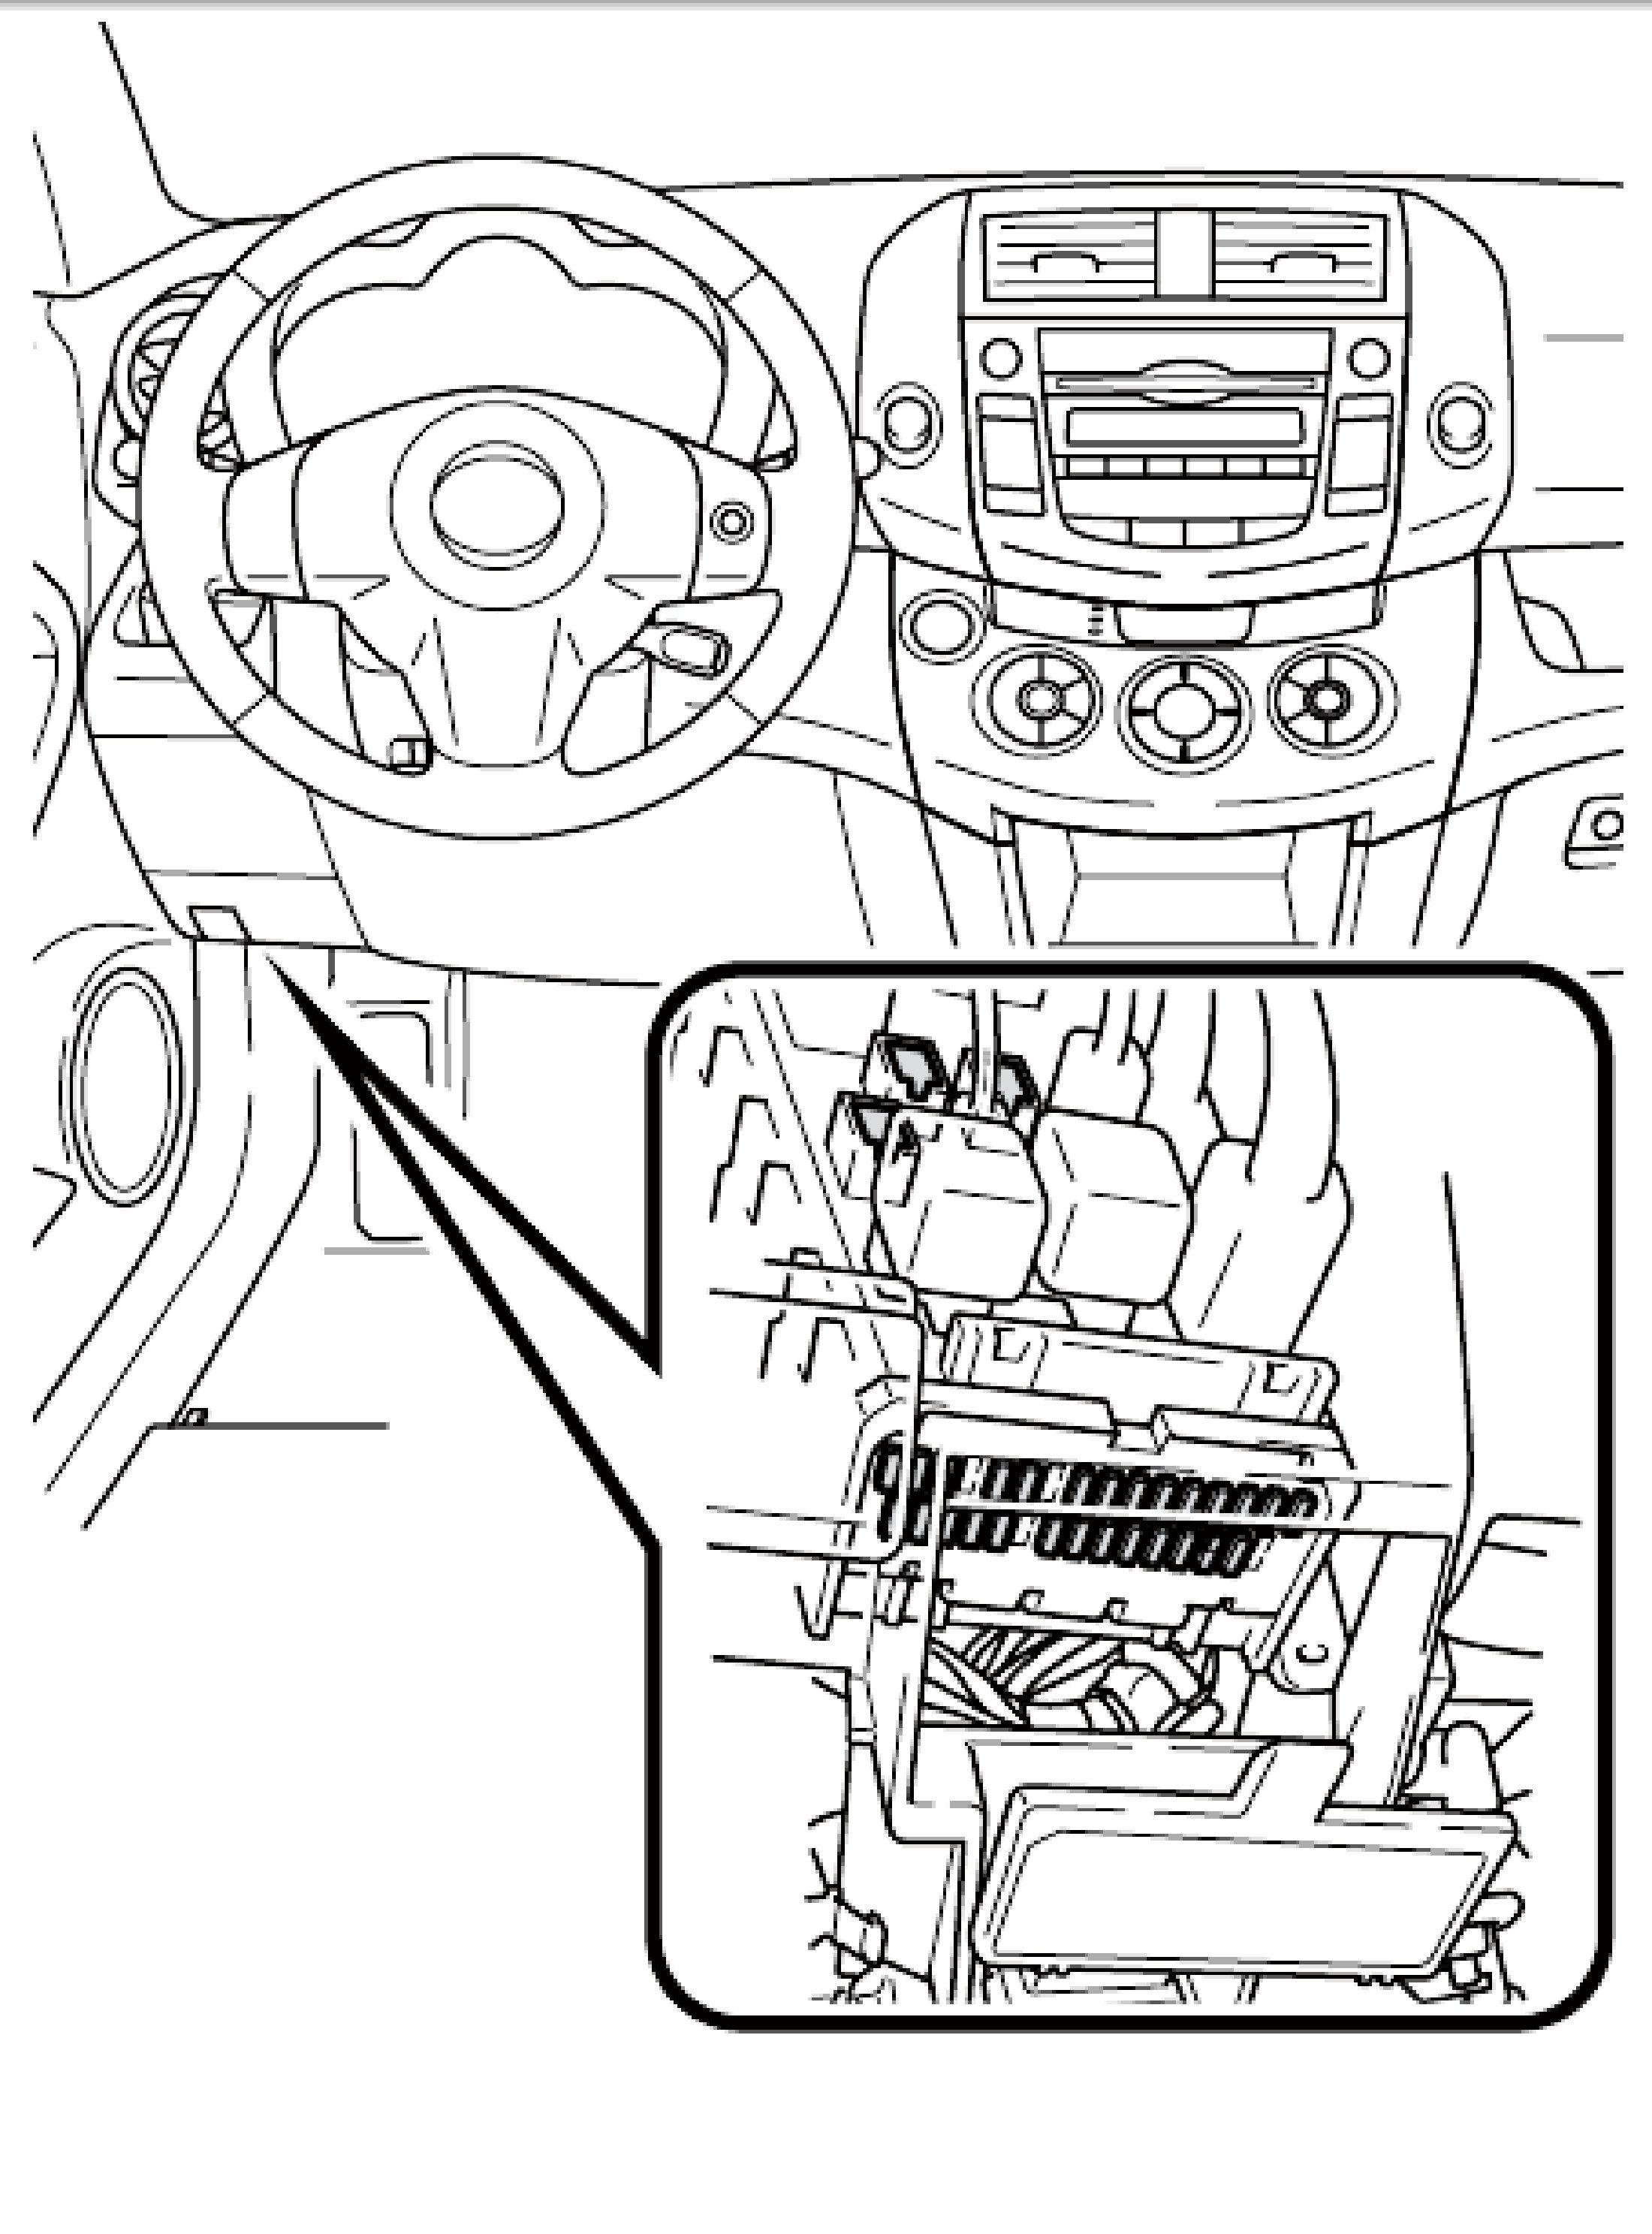 1996 Toyota Rav4 Diagram Fuse Box Wiring Location 2007 Efcaviation Com Exhaust System